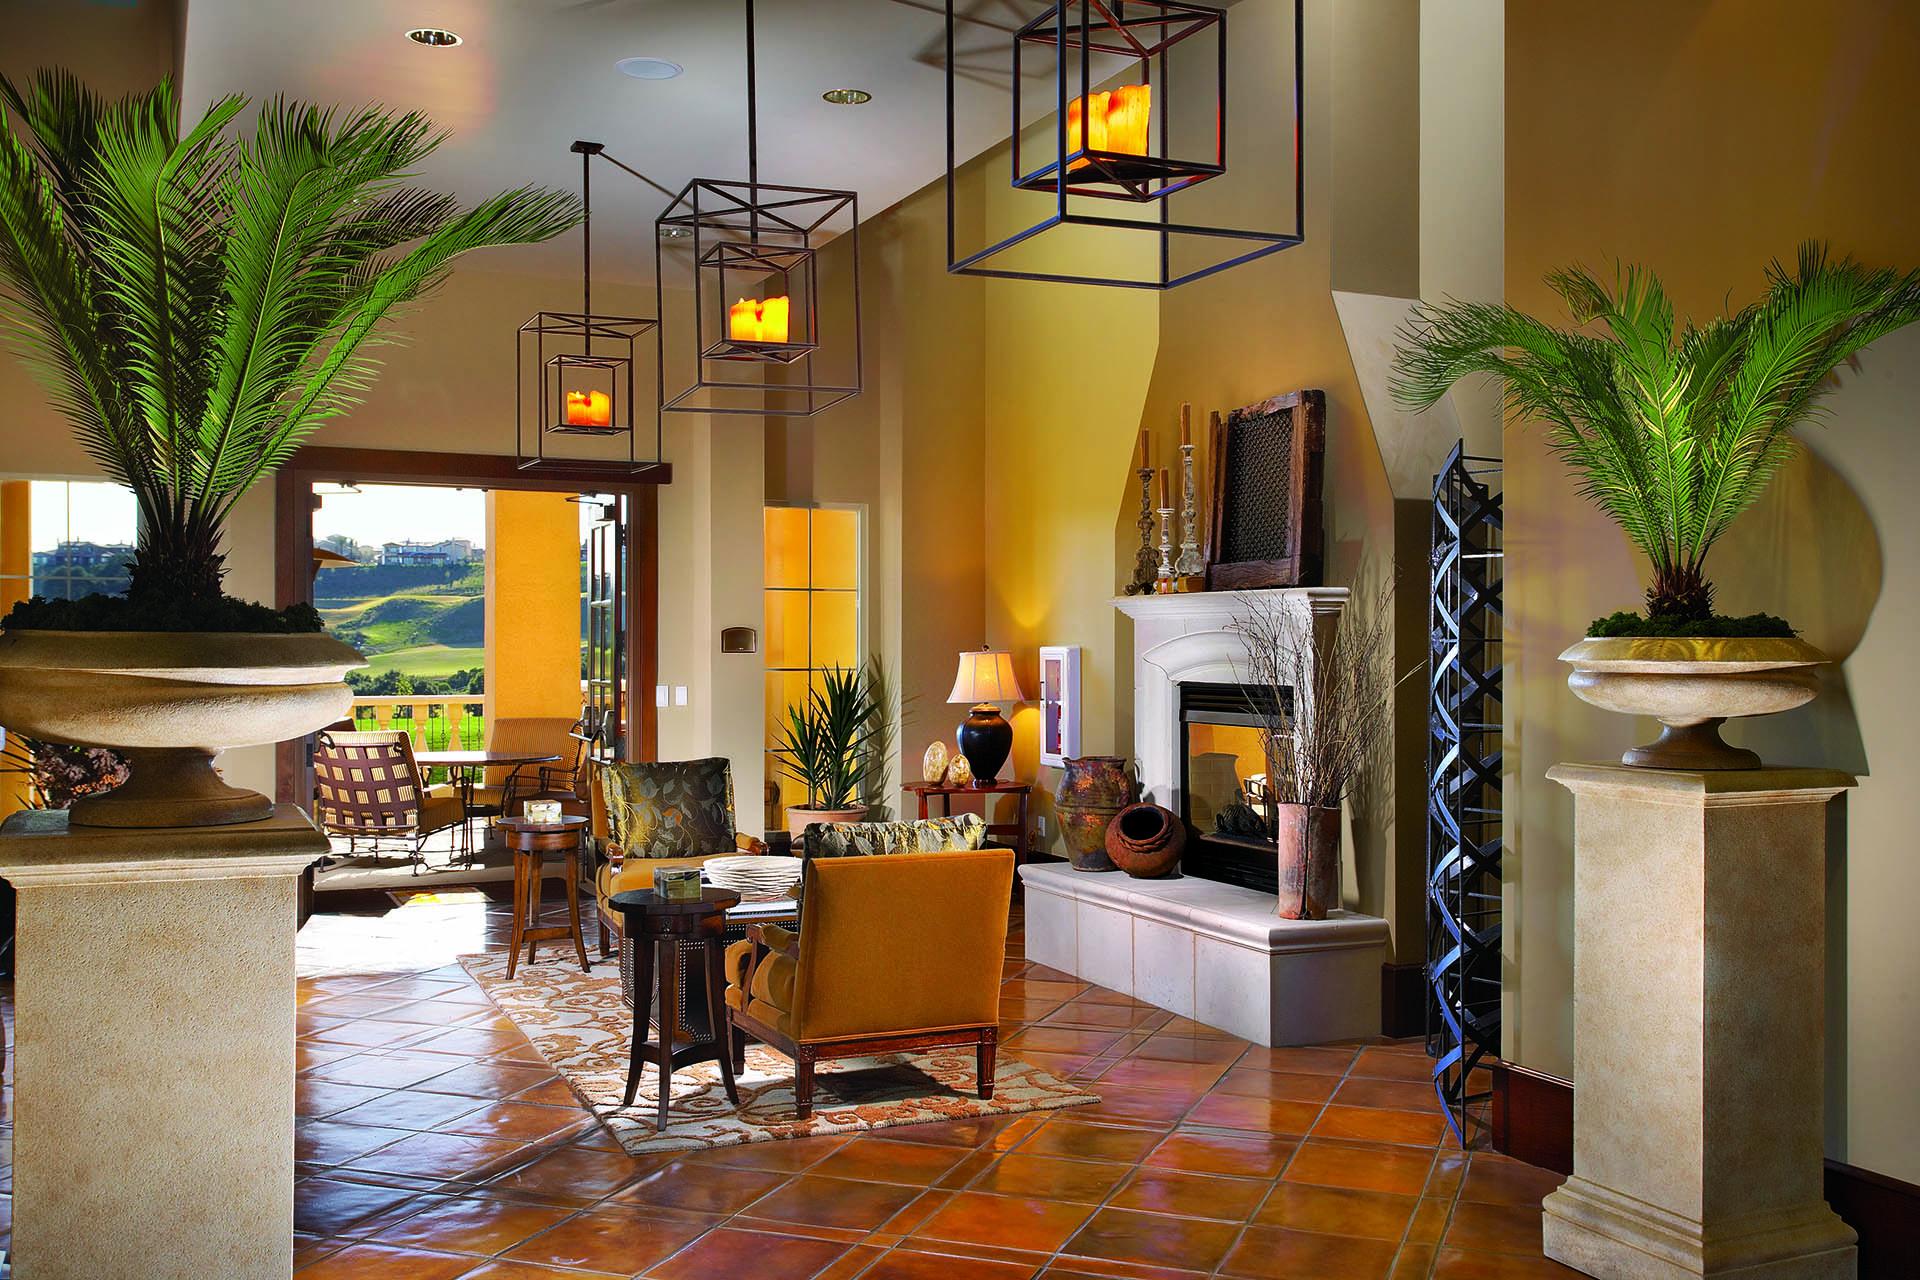 Mediterranean Estate Wedgewood Weddings Vellano Chino Hills California